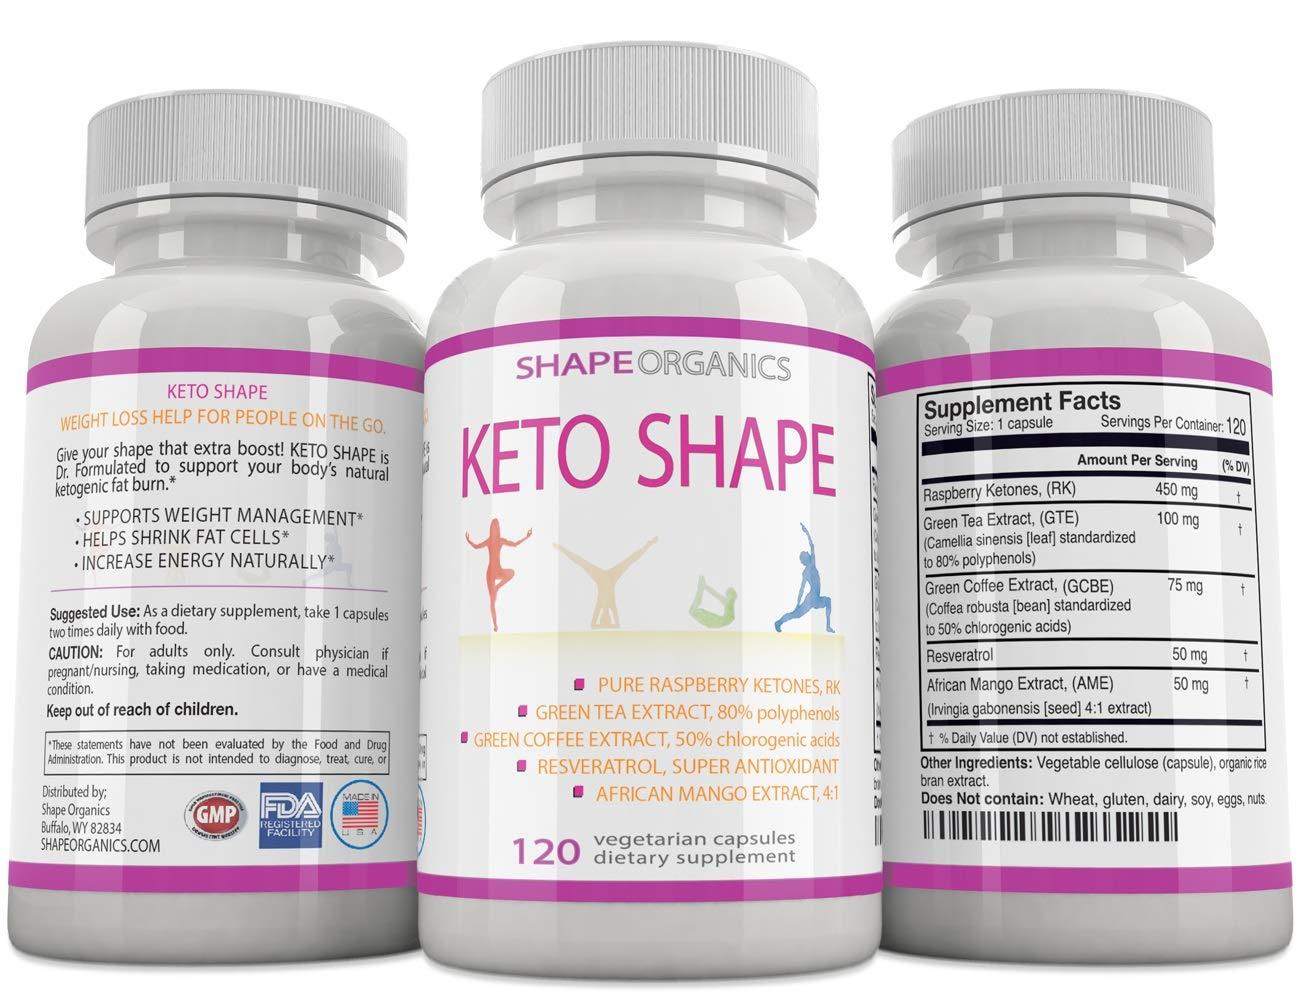 Keto Shape Fat Burn Formula: Max KETOSIS Energy Booster Complex Diet Pill That Works Fast for Women and Men, Green Tea, Coffee Bean Extract, Raspberry Ketone, African Mango, Resveratrol 120 Veg Cap by Shape Organics